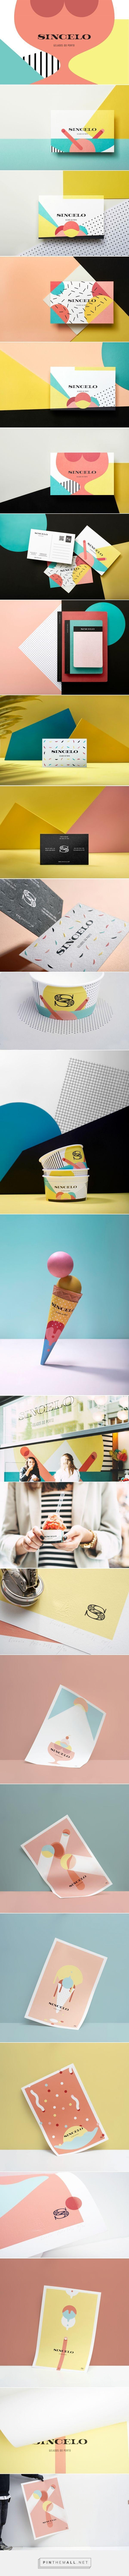 Sincelo Branding on Behance | Fivestar Branding – Design and Branding Agency & Inspiration Gallery